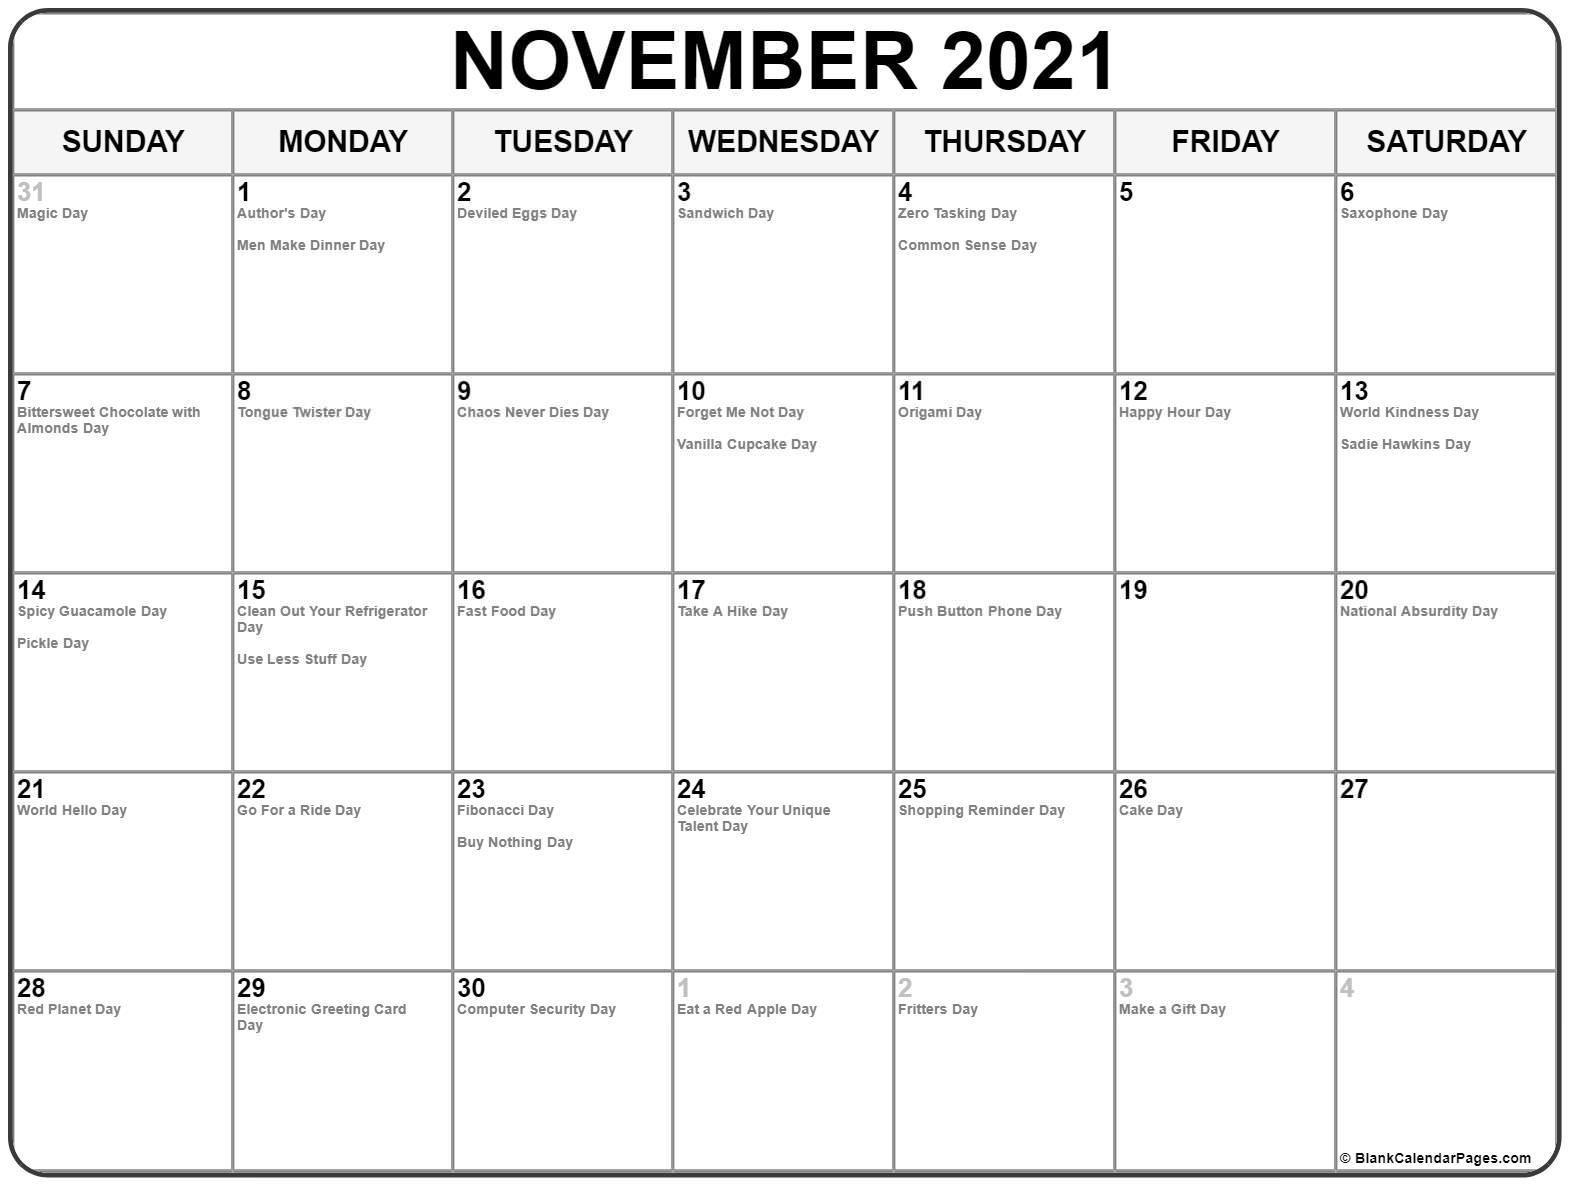 November 2021 With Holidays Calendar